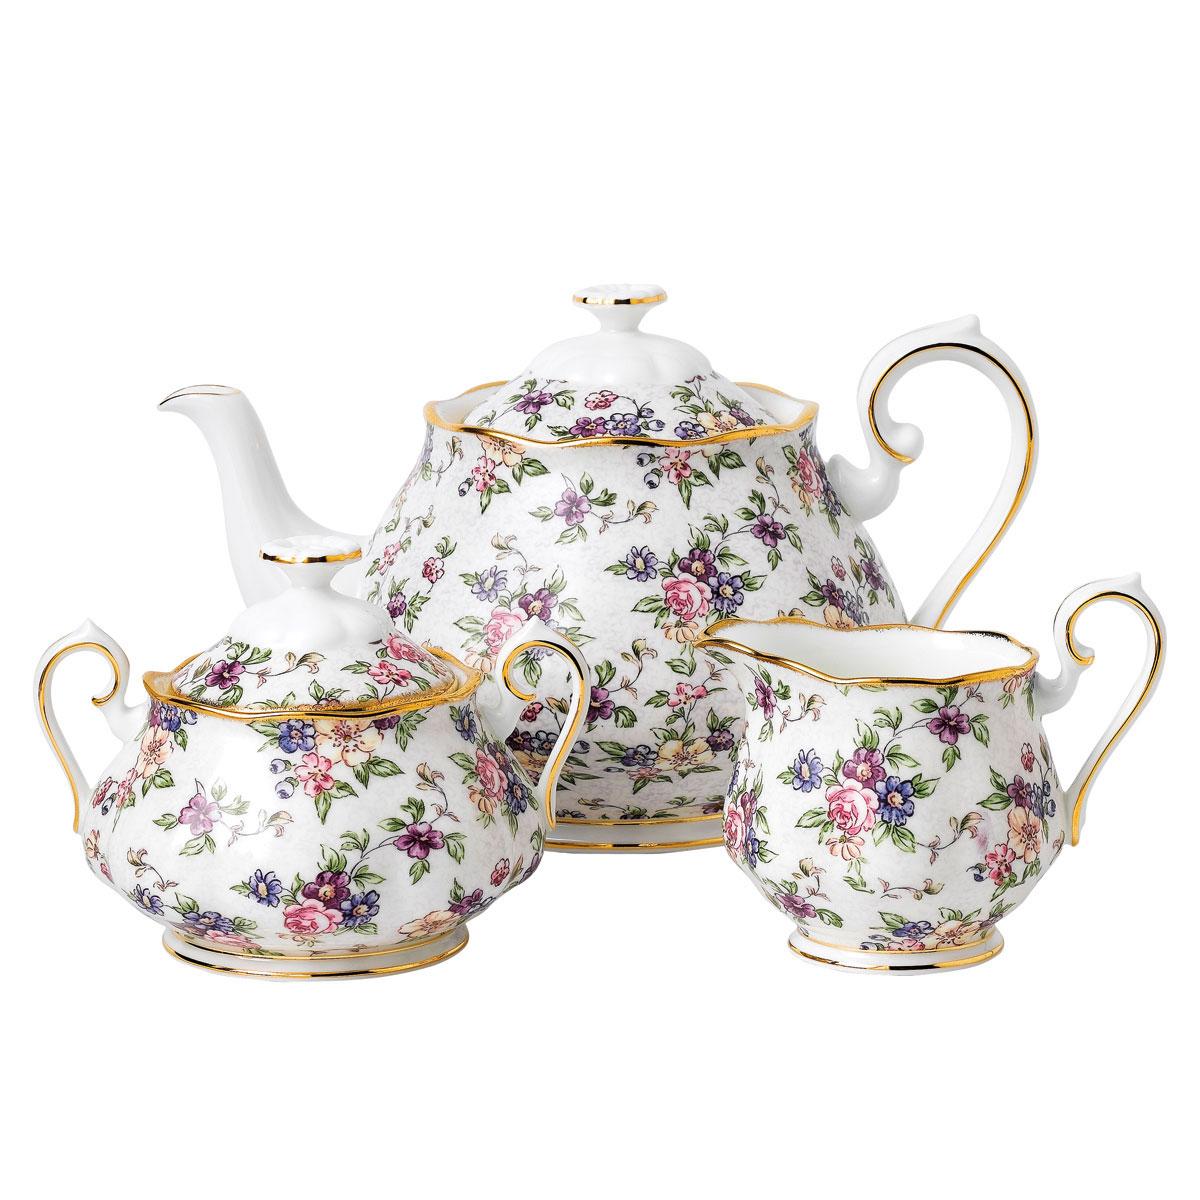 Royal Albert 100 Years 1940 Teapot, Sugar and Creamer Setenglish Chintz